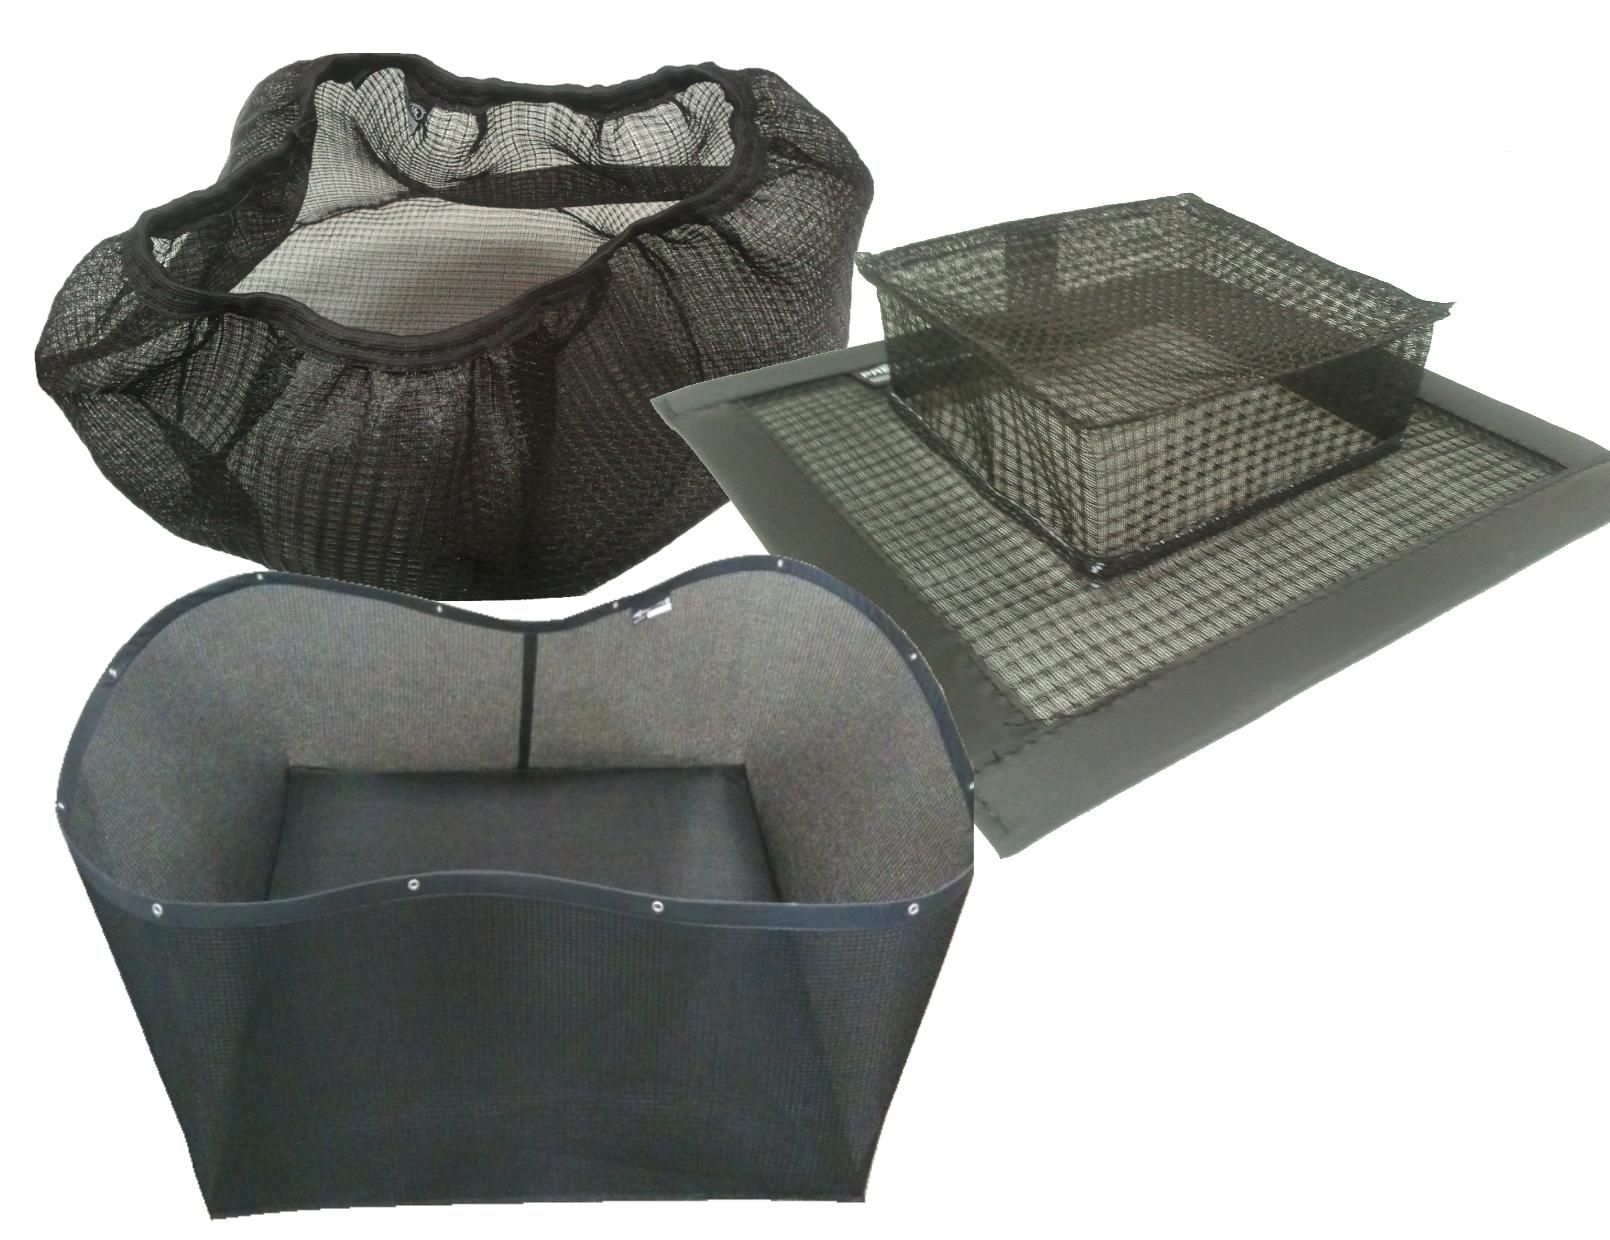 bonnet style air filters